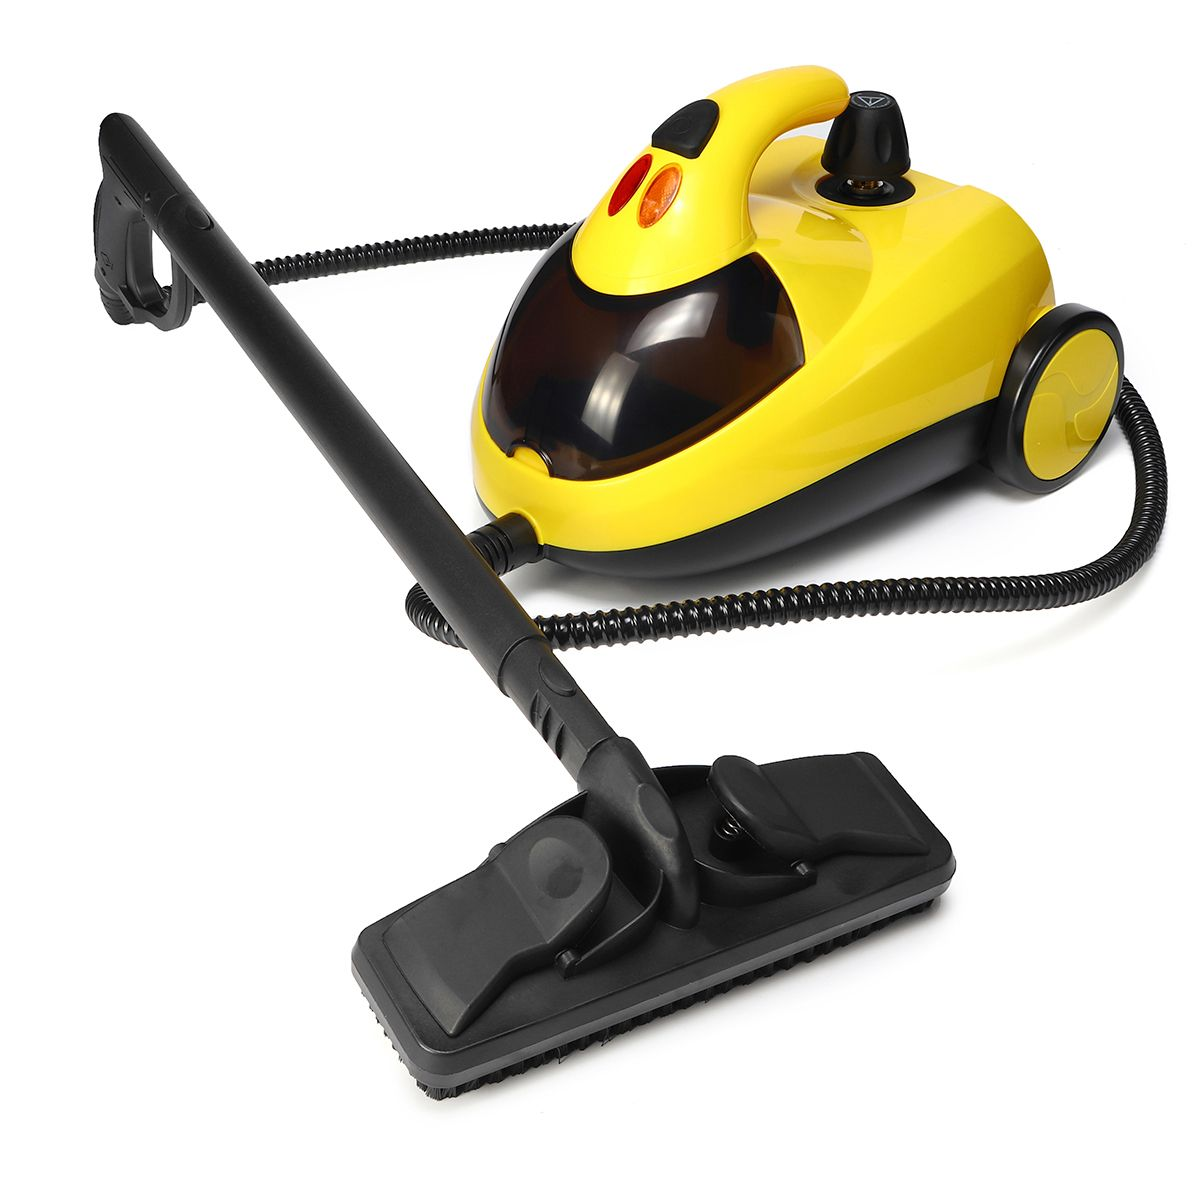 13in1 AU220V 1.5L4.0 2000W Bar High Pressure Steam Floor Carpet Cleaner Washer Cleaning Machine 360 Wheel for Clean Bathroom Car